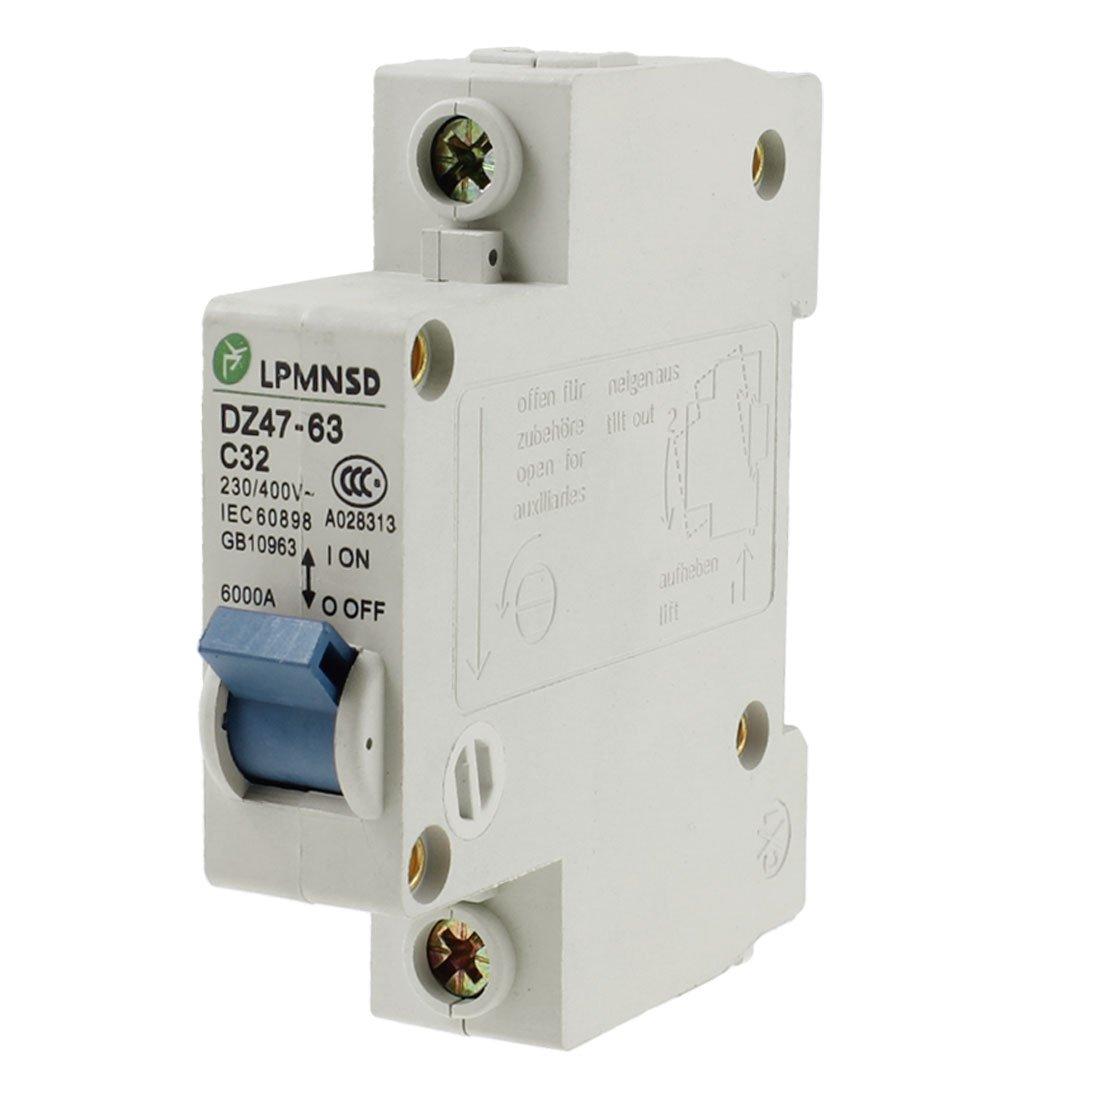 Uxcell Ac 230v 400v 32a Dz47 63 C32 1 Pole Mcb Miniature Circuit 220v 2 63a Mini Breaker Buy Industrial Scientific